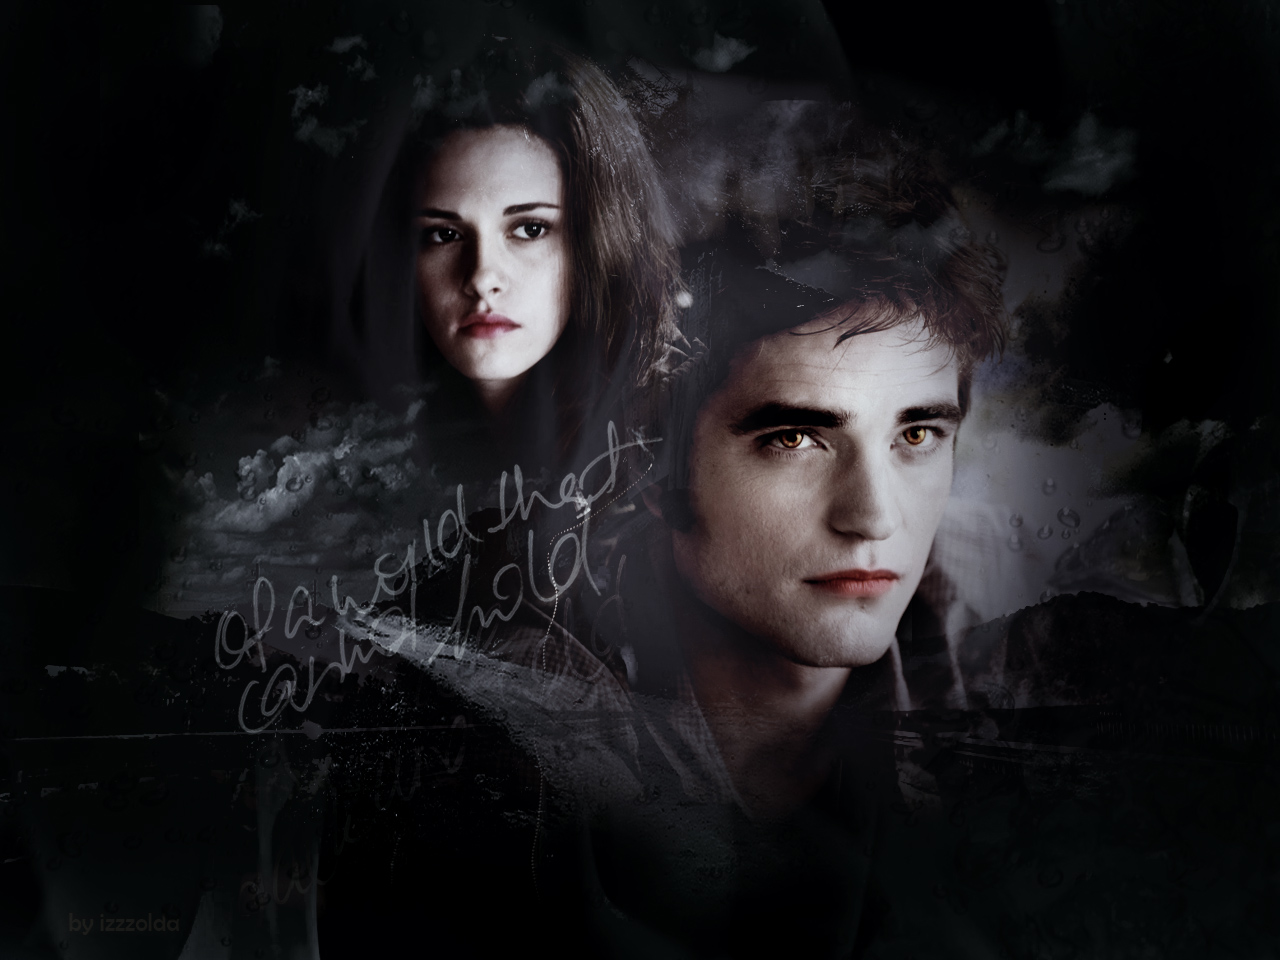 Edward Cullen Bella Swan by izzzolda on DeviantArt